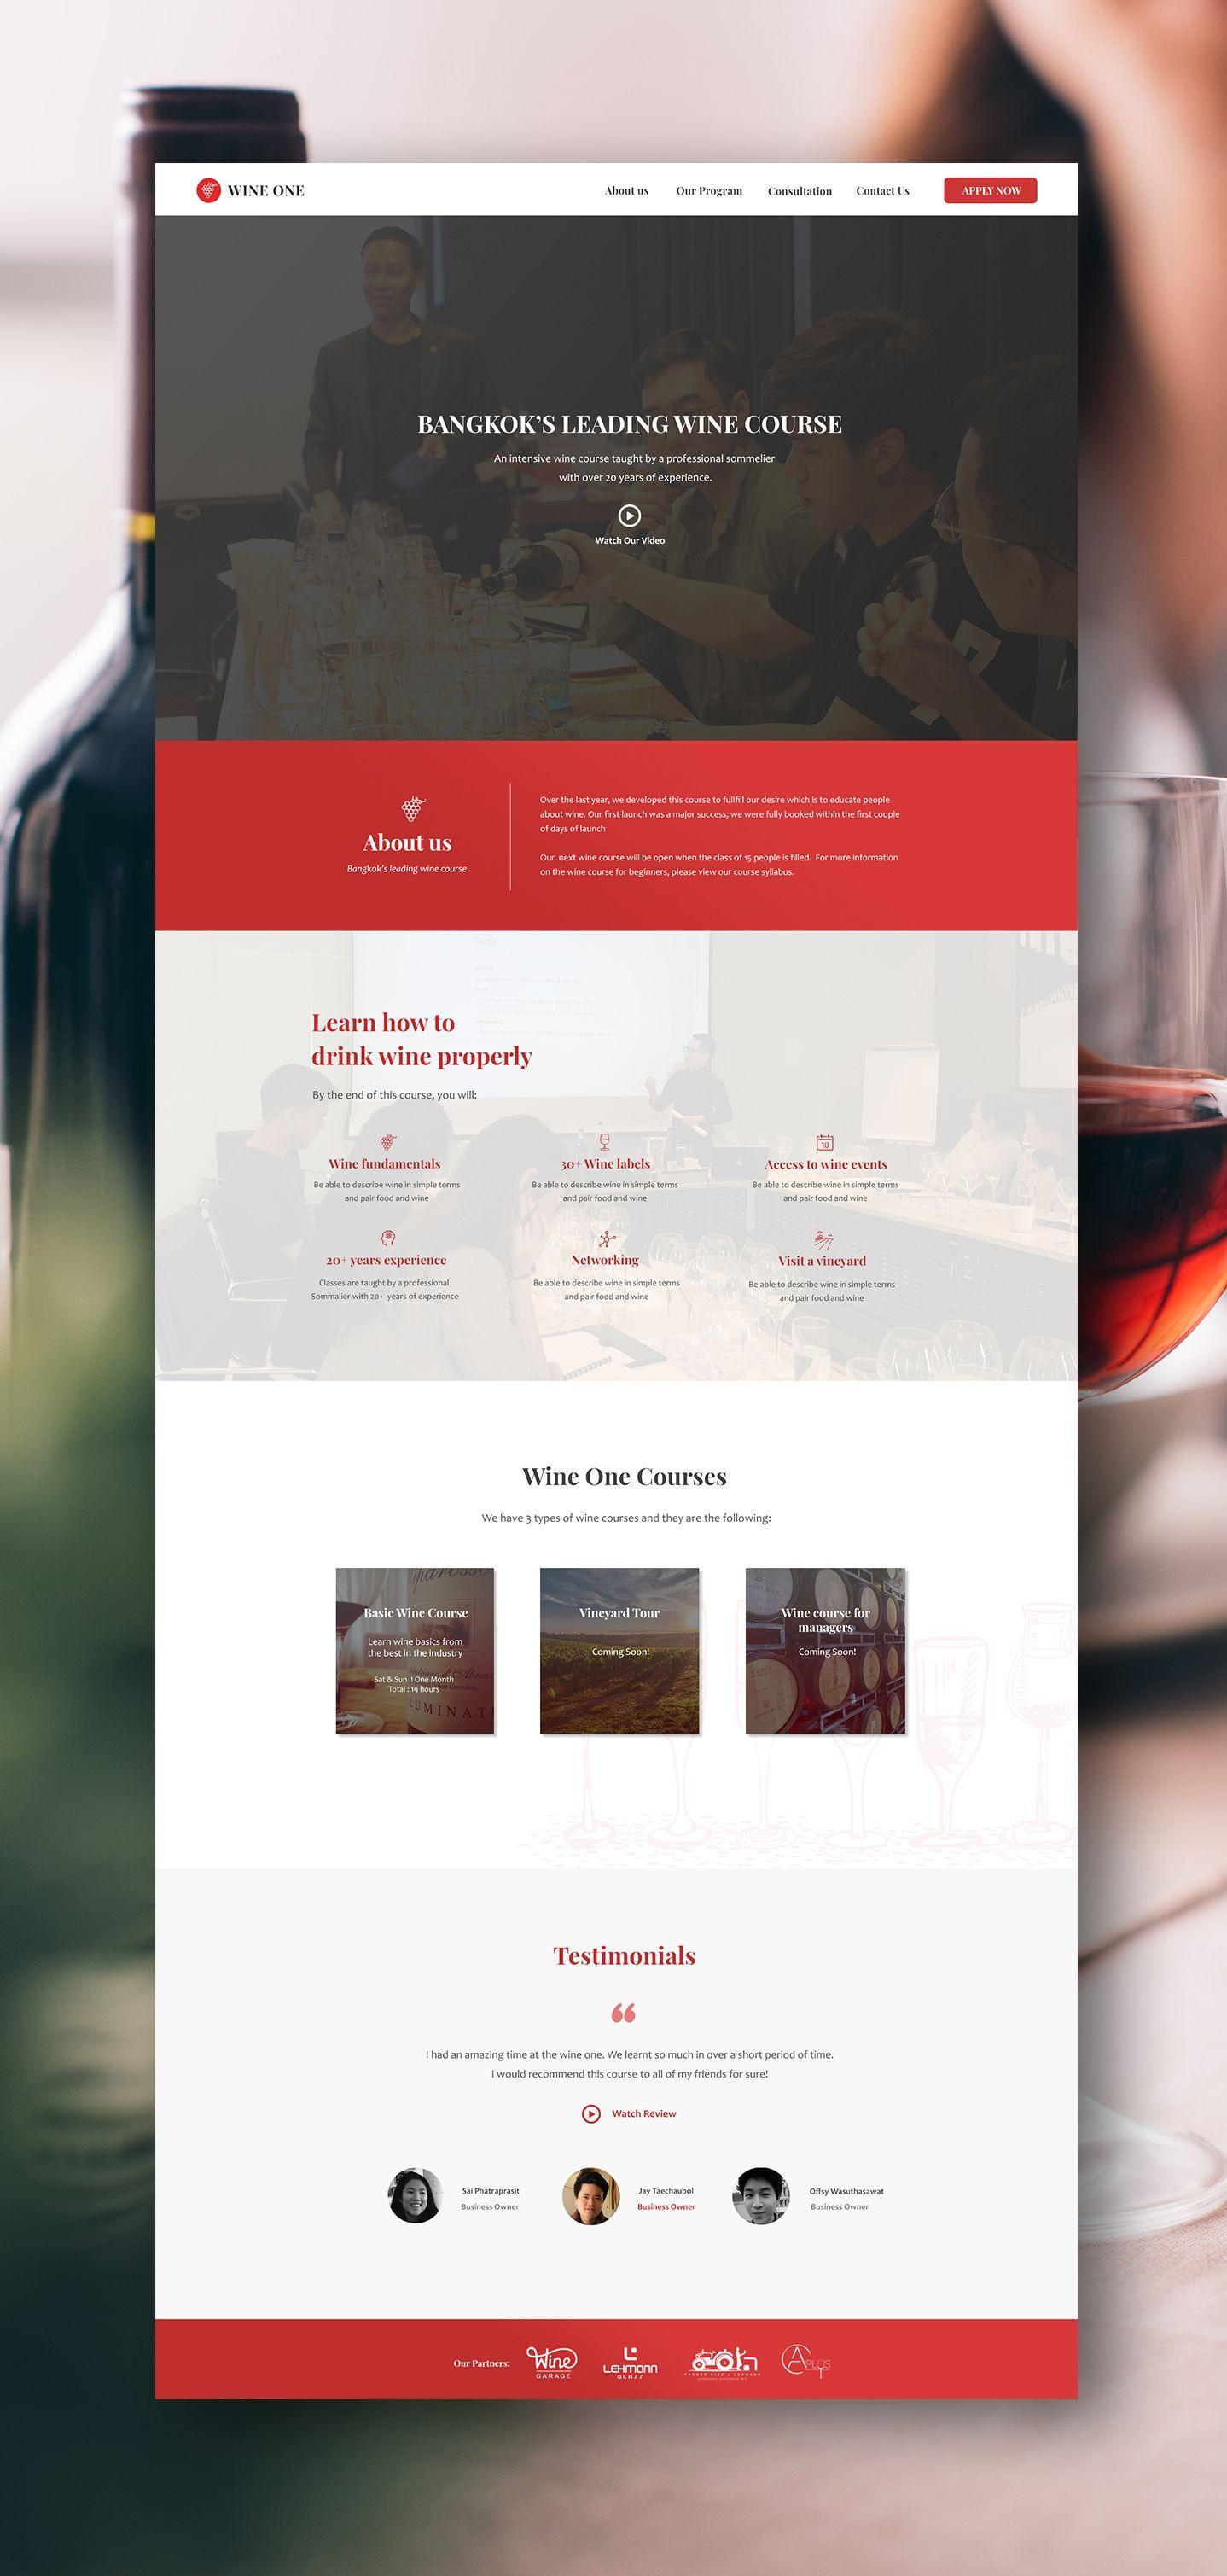 Wine One Yes Web Design Studio L Web Design Bangkok Thailand Web Design Studio Web Design Web Design Company